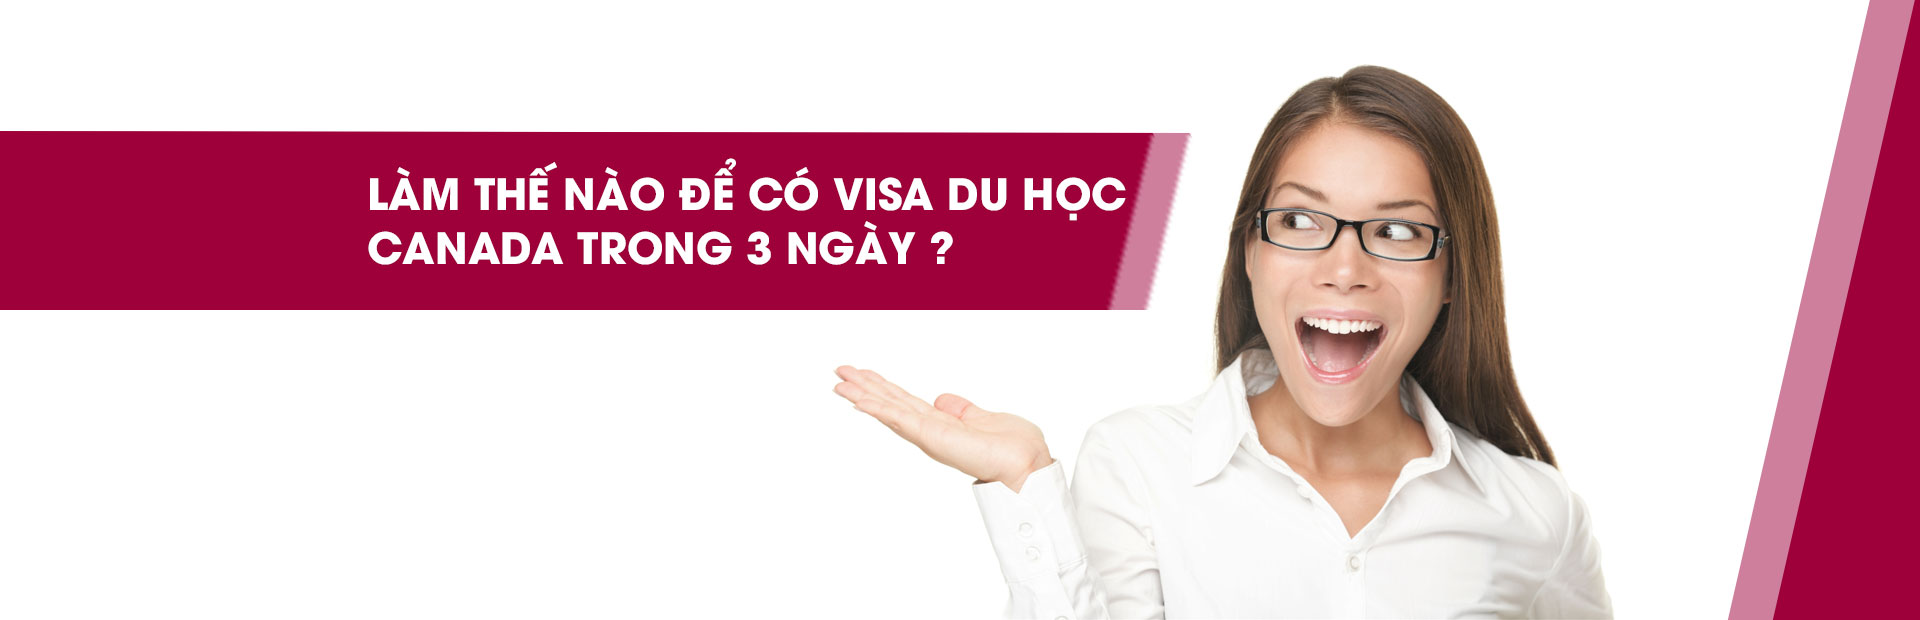 https://duhocinec.com/du-hoc-canada-khong-chung-minh-tai-chinh-chuong-trinh-canada-express-study-cua-lanh-su-quan